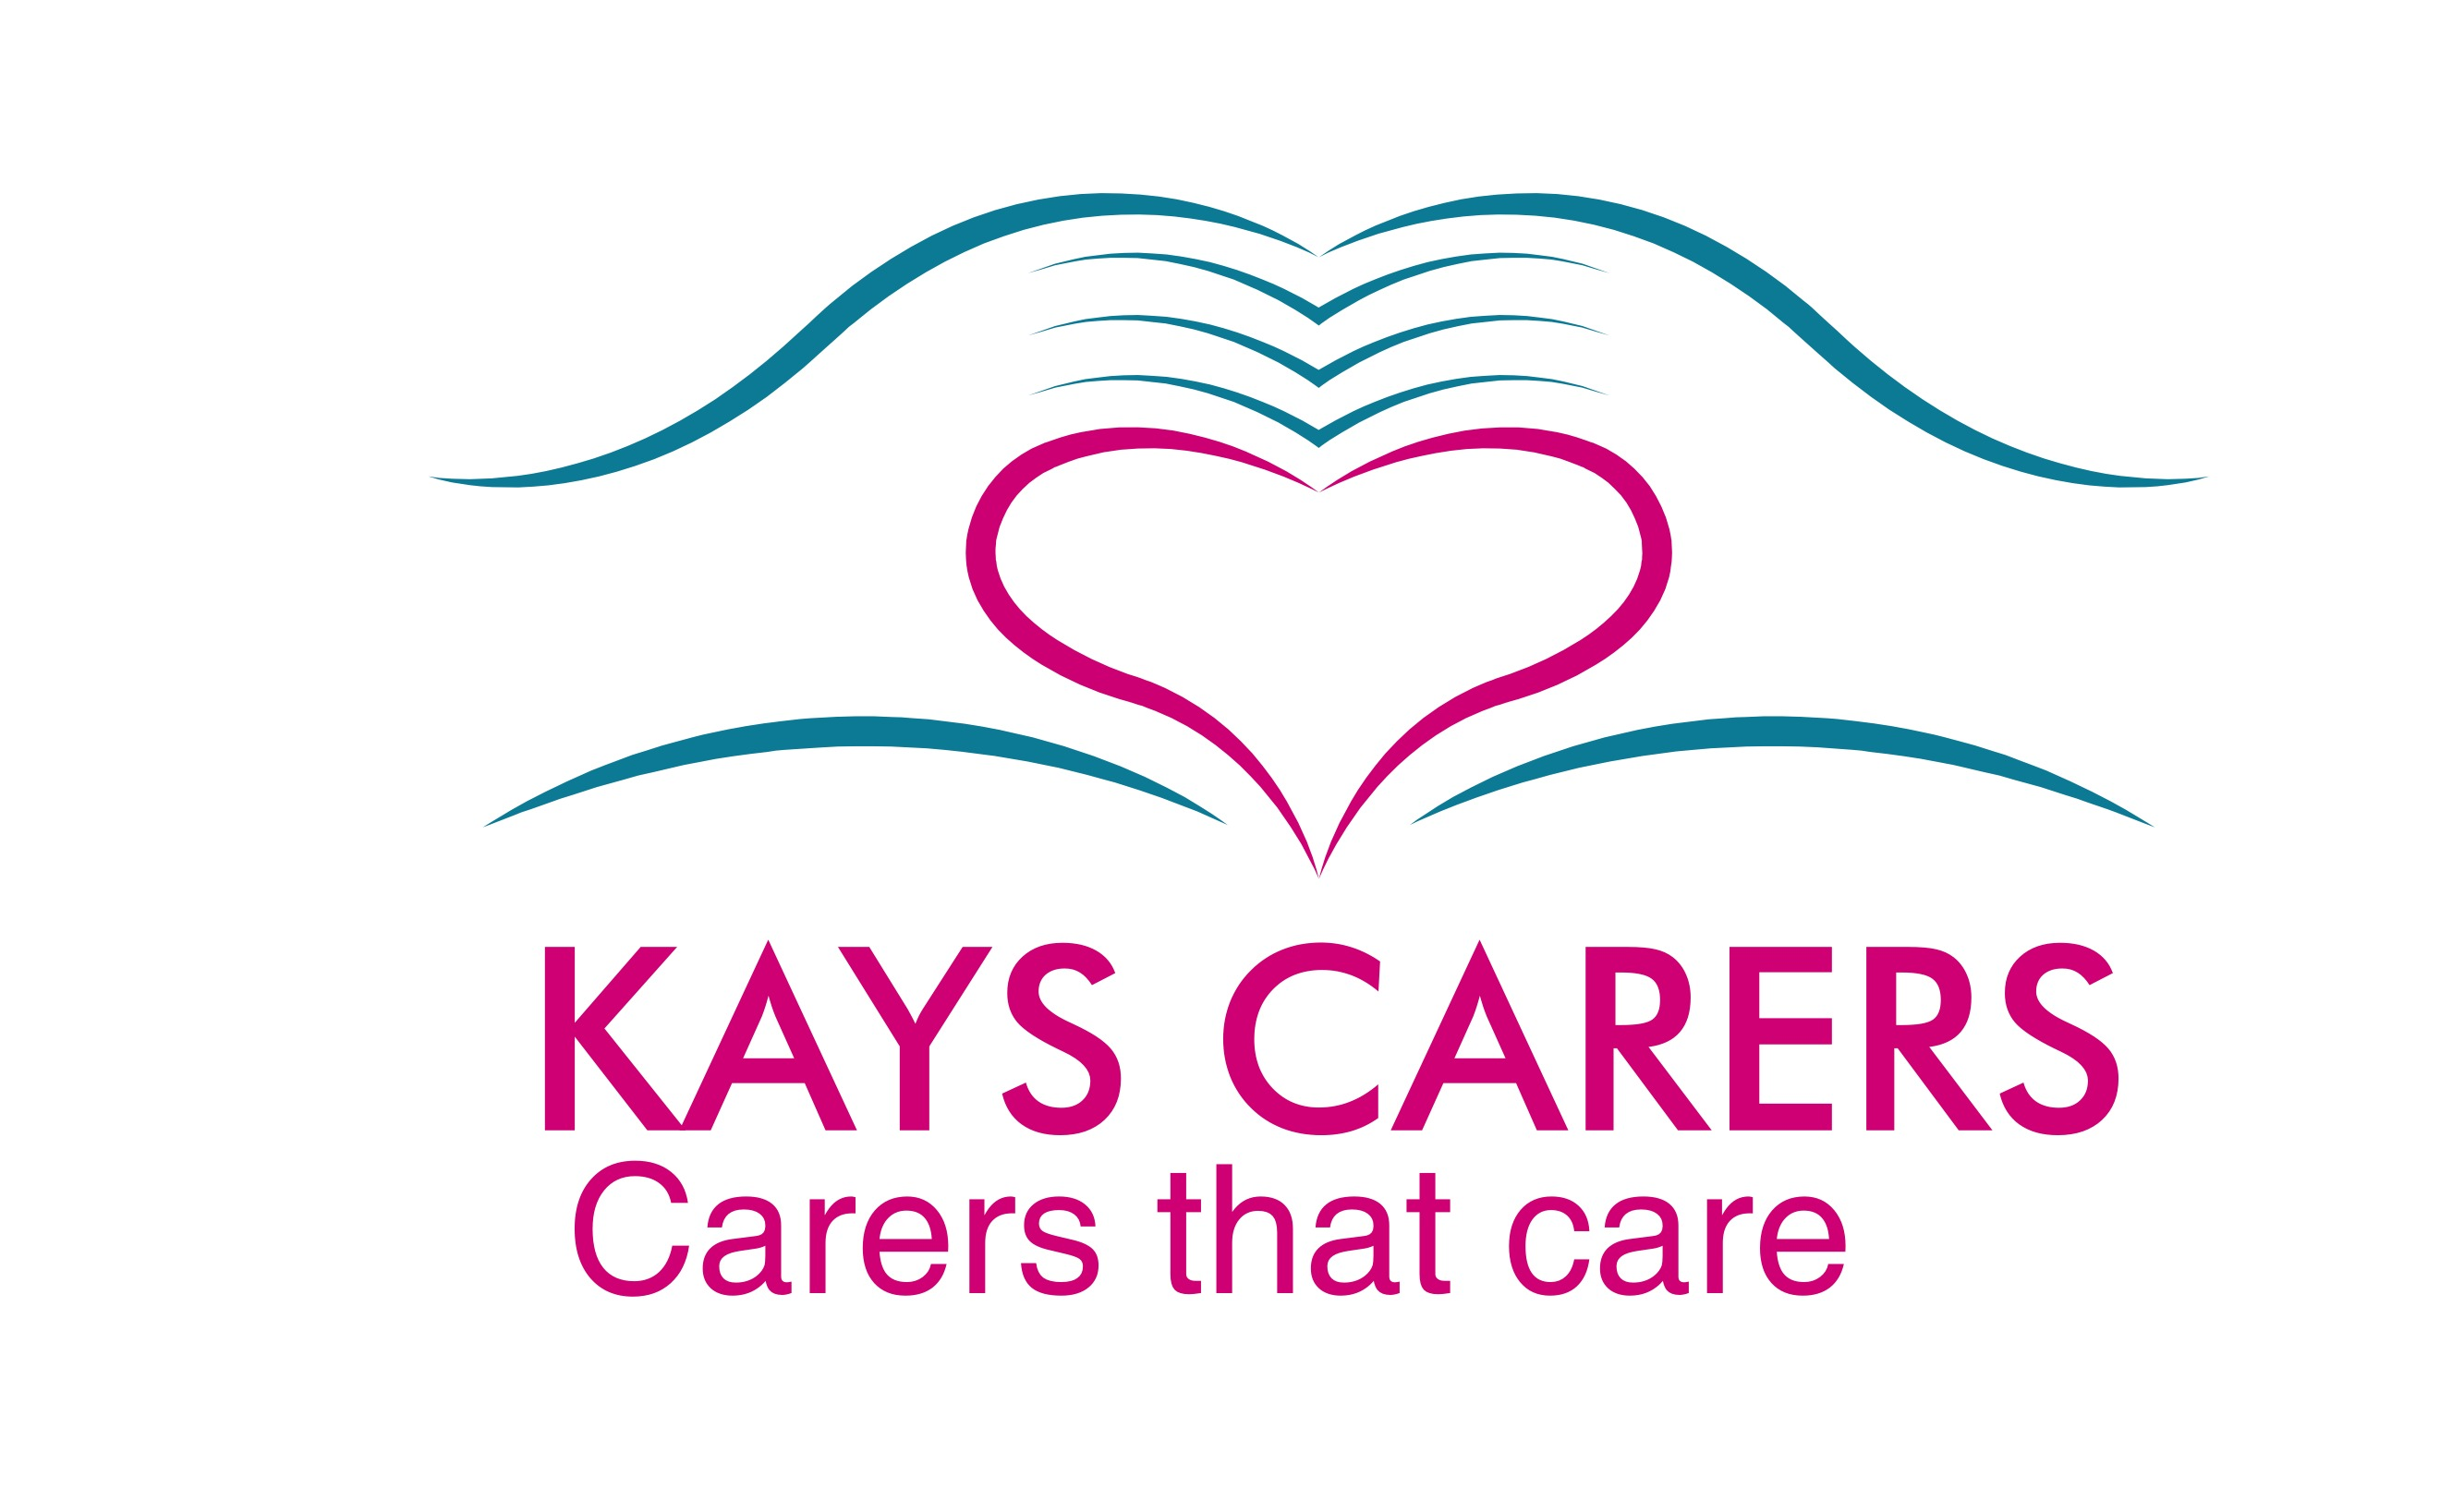 Kays Carers Ltd